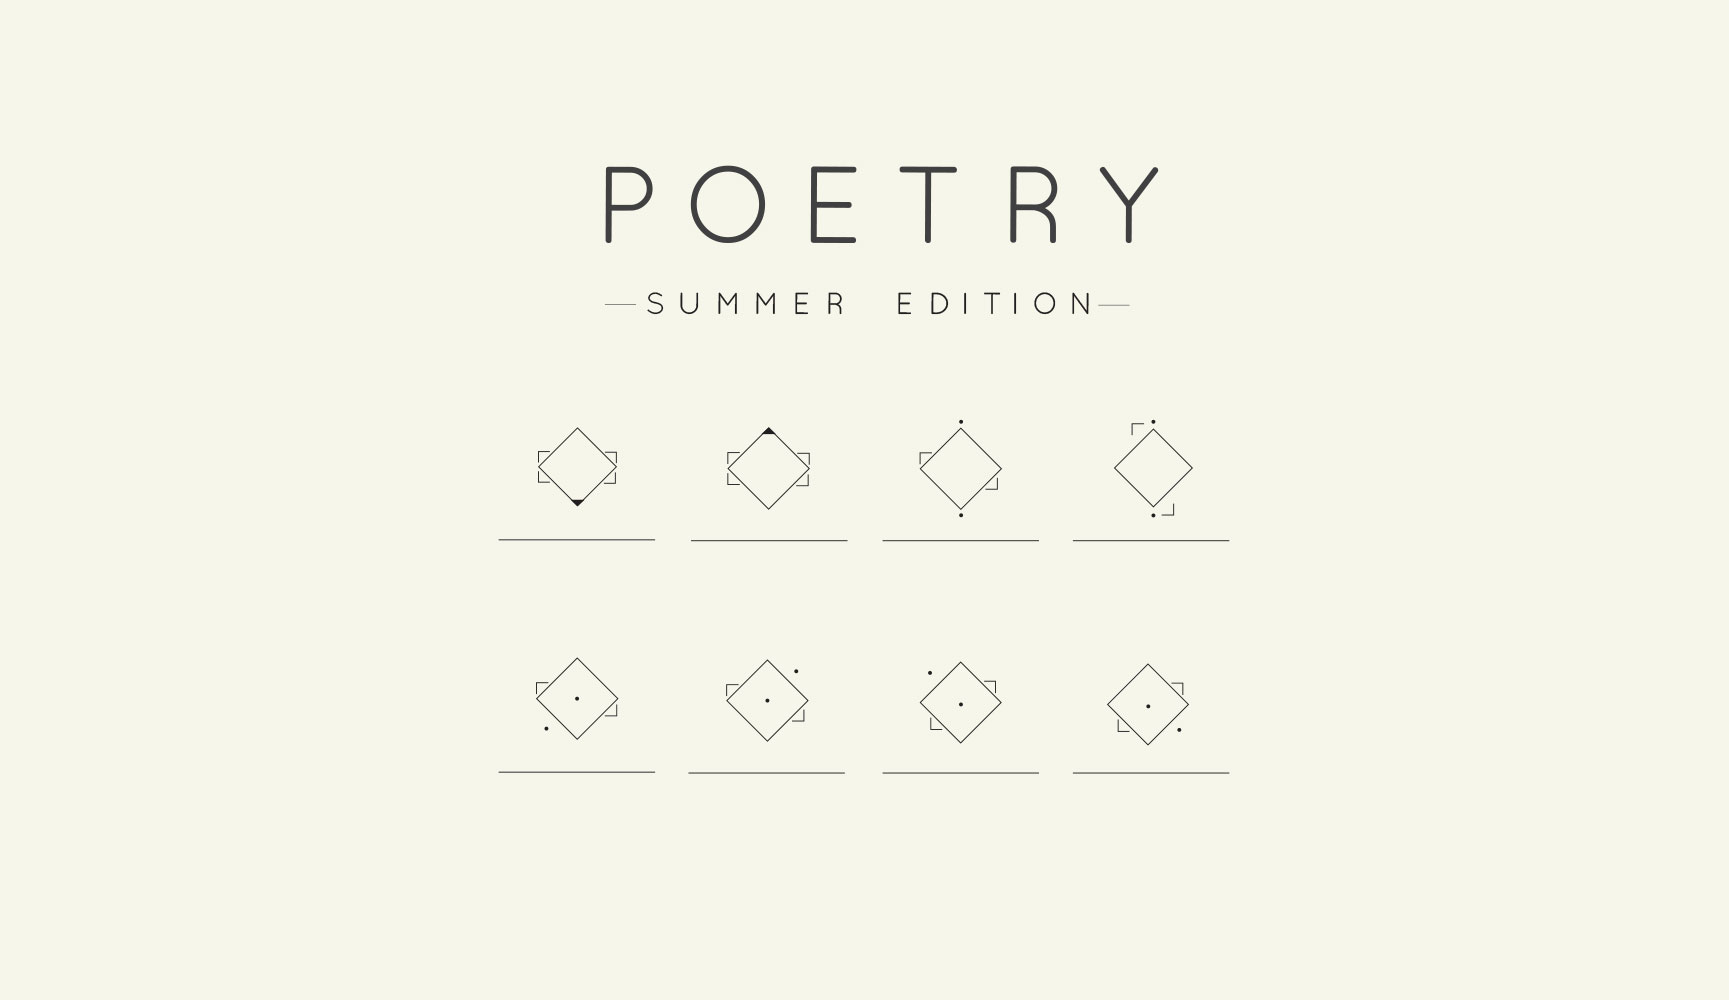 Ninth letter summer 2014 poetry header image stopboris Images